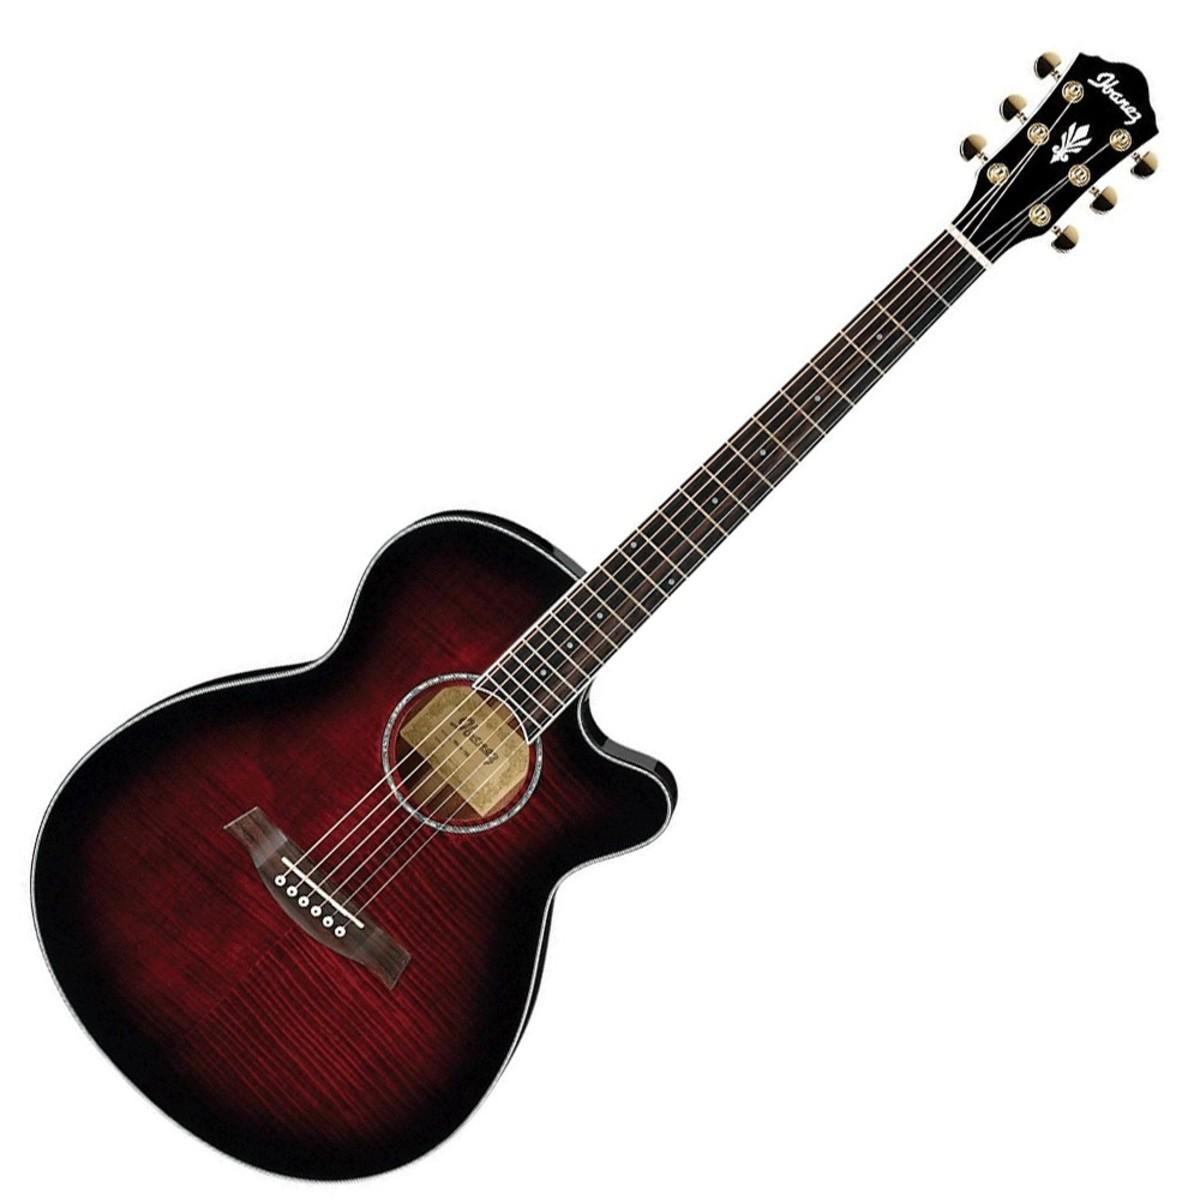 disc guitare electro acoustique ibanez ael20e rouge dgrad. Black Bedroom Furniture Sets. Home Design Ideas